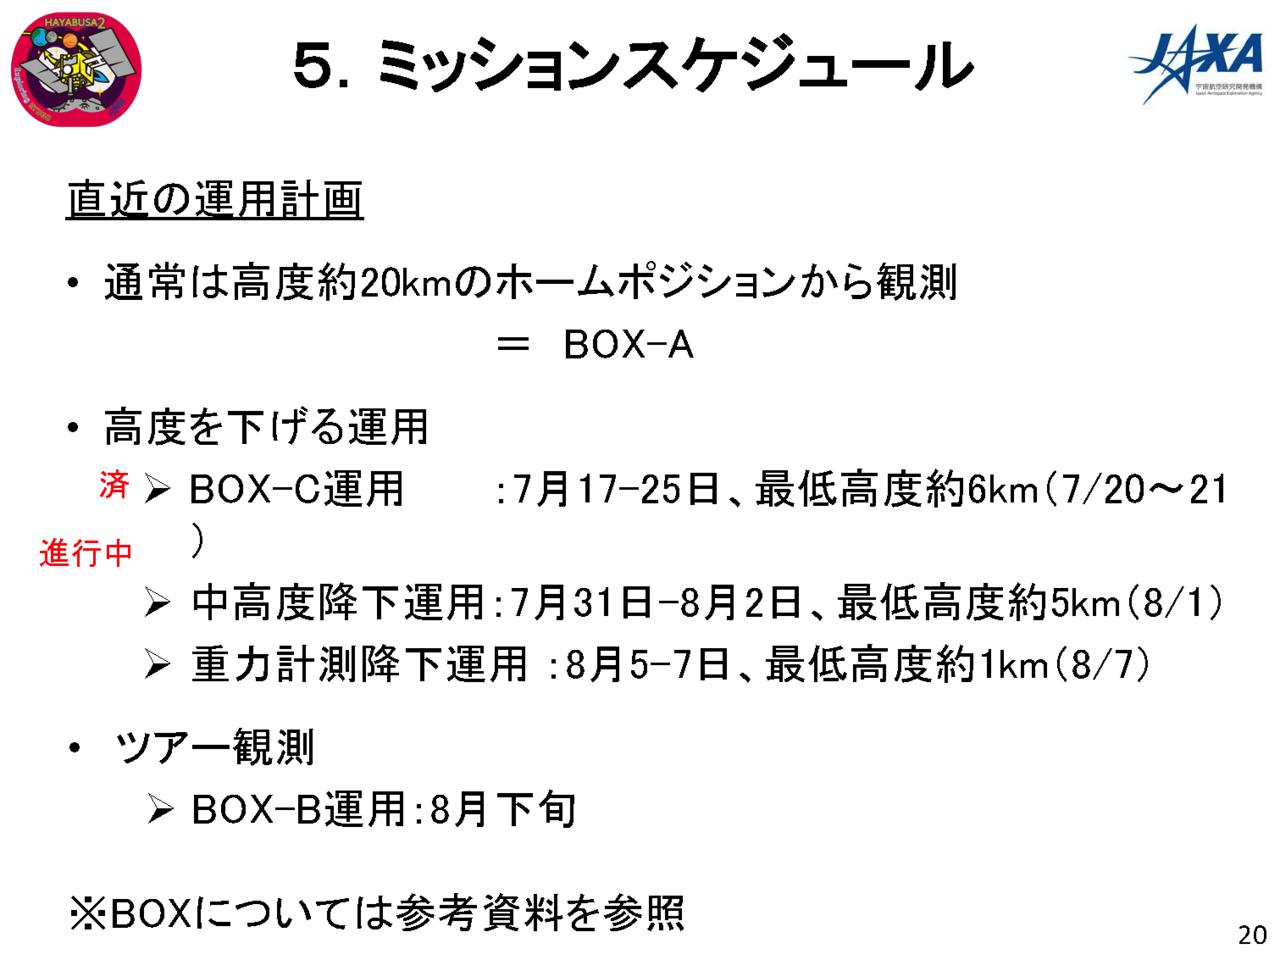 f:id:Imamura:20180802145940p:plain